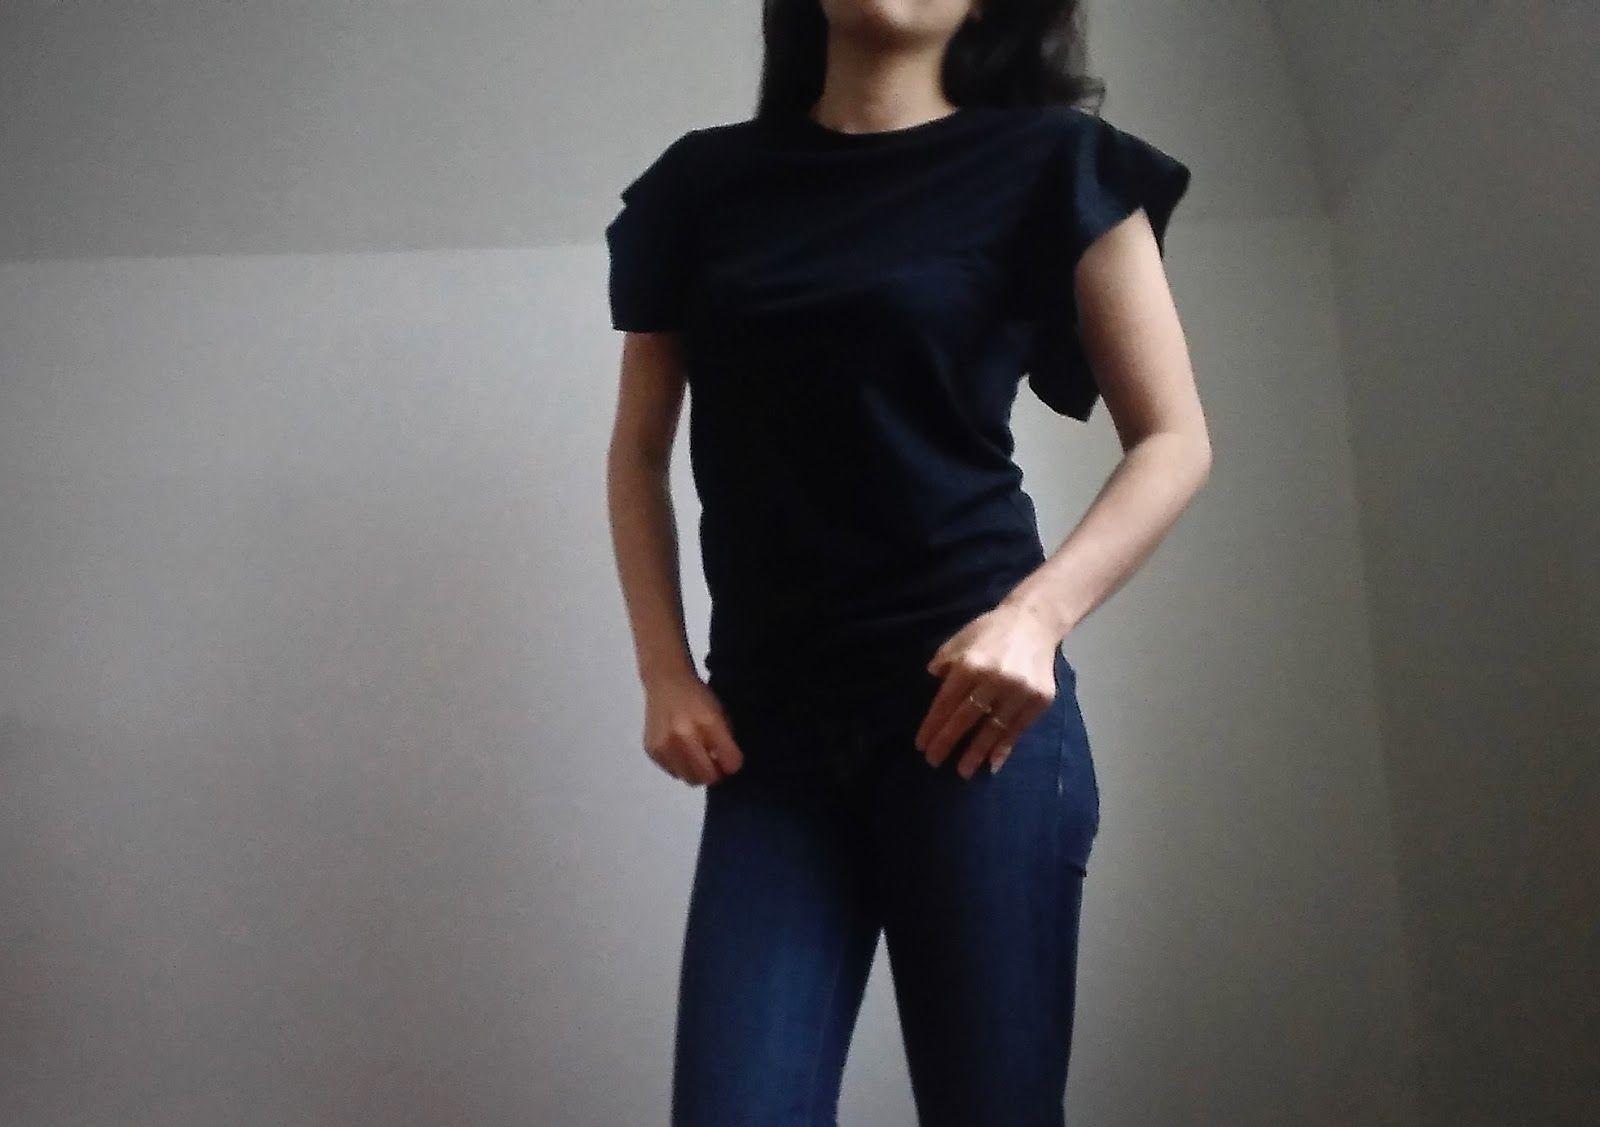 DIY: Make an Isabel Marant Felipe top